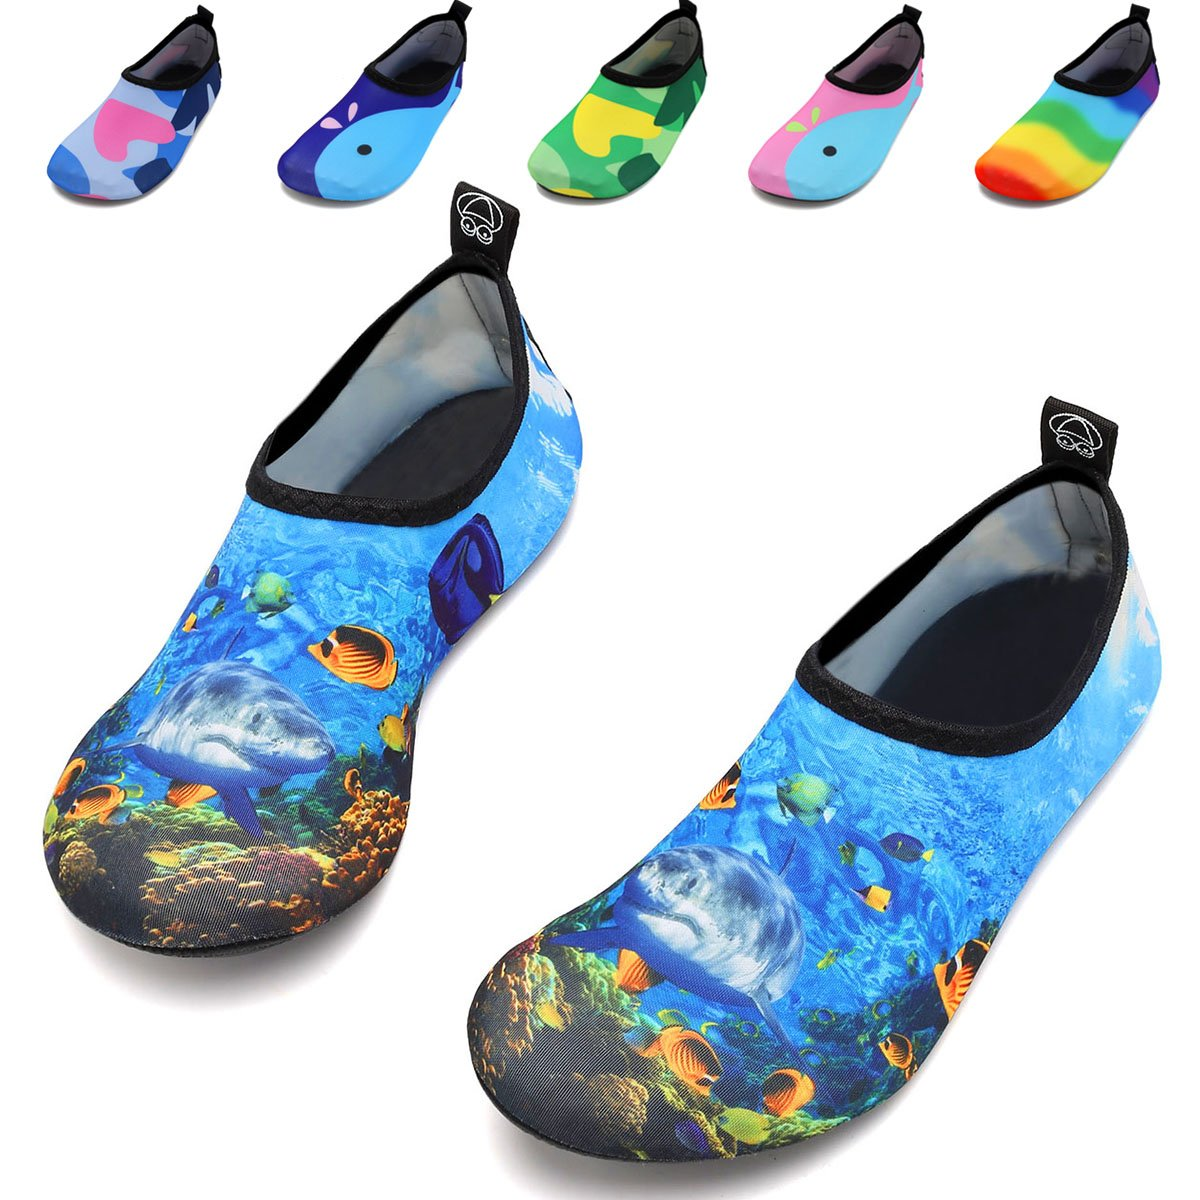 VIFUUR Kids Girls Boys Water Shoes Lightweight Barefoot Quick-Dry Aqua Yoga Socks for Beach Swimming KDeepSea 22/23 by VIFUUR (Image #1)